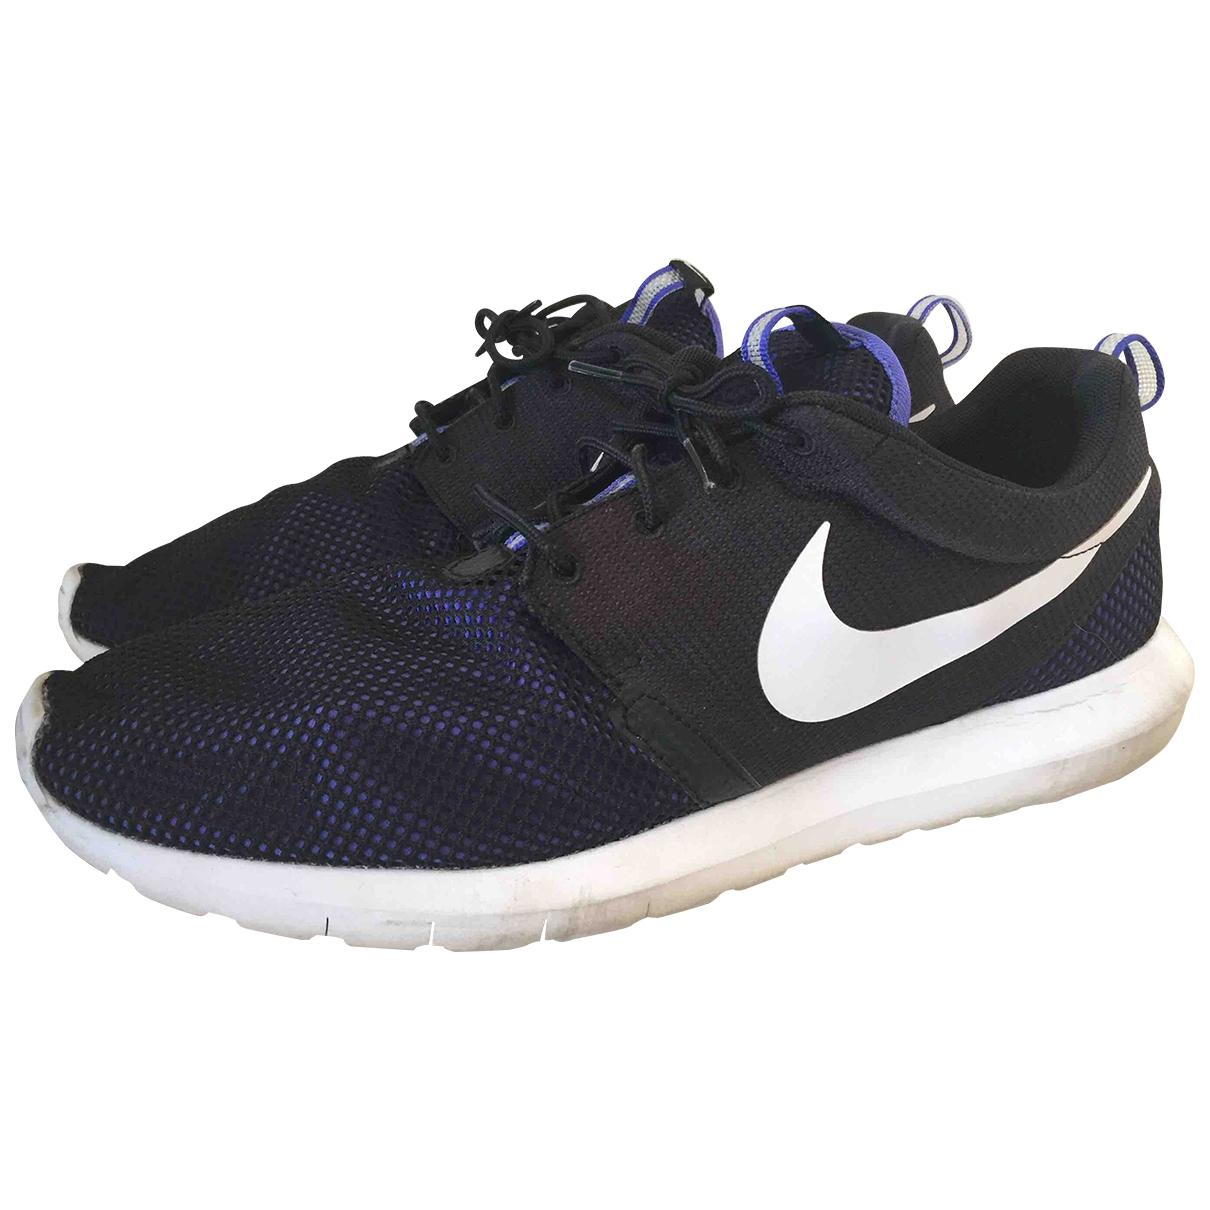 Nike - Baskets Roshe Run pour homme en toile - bleu